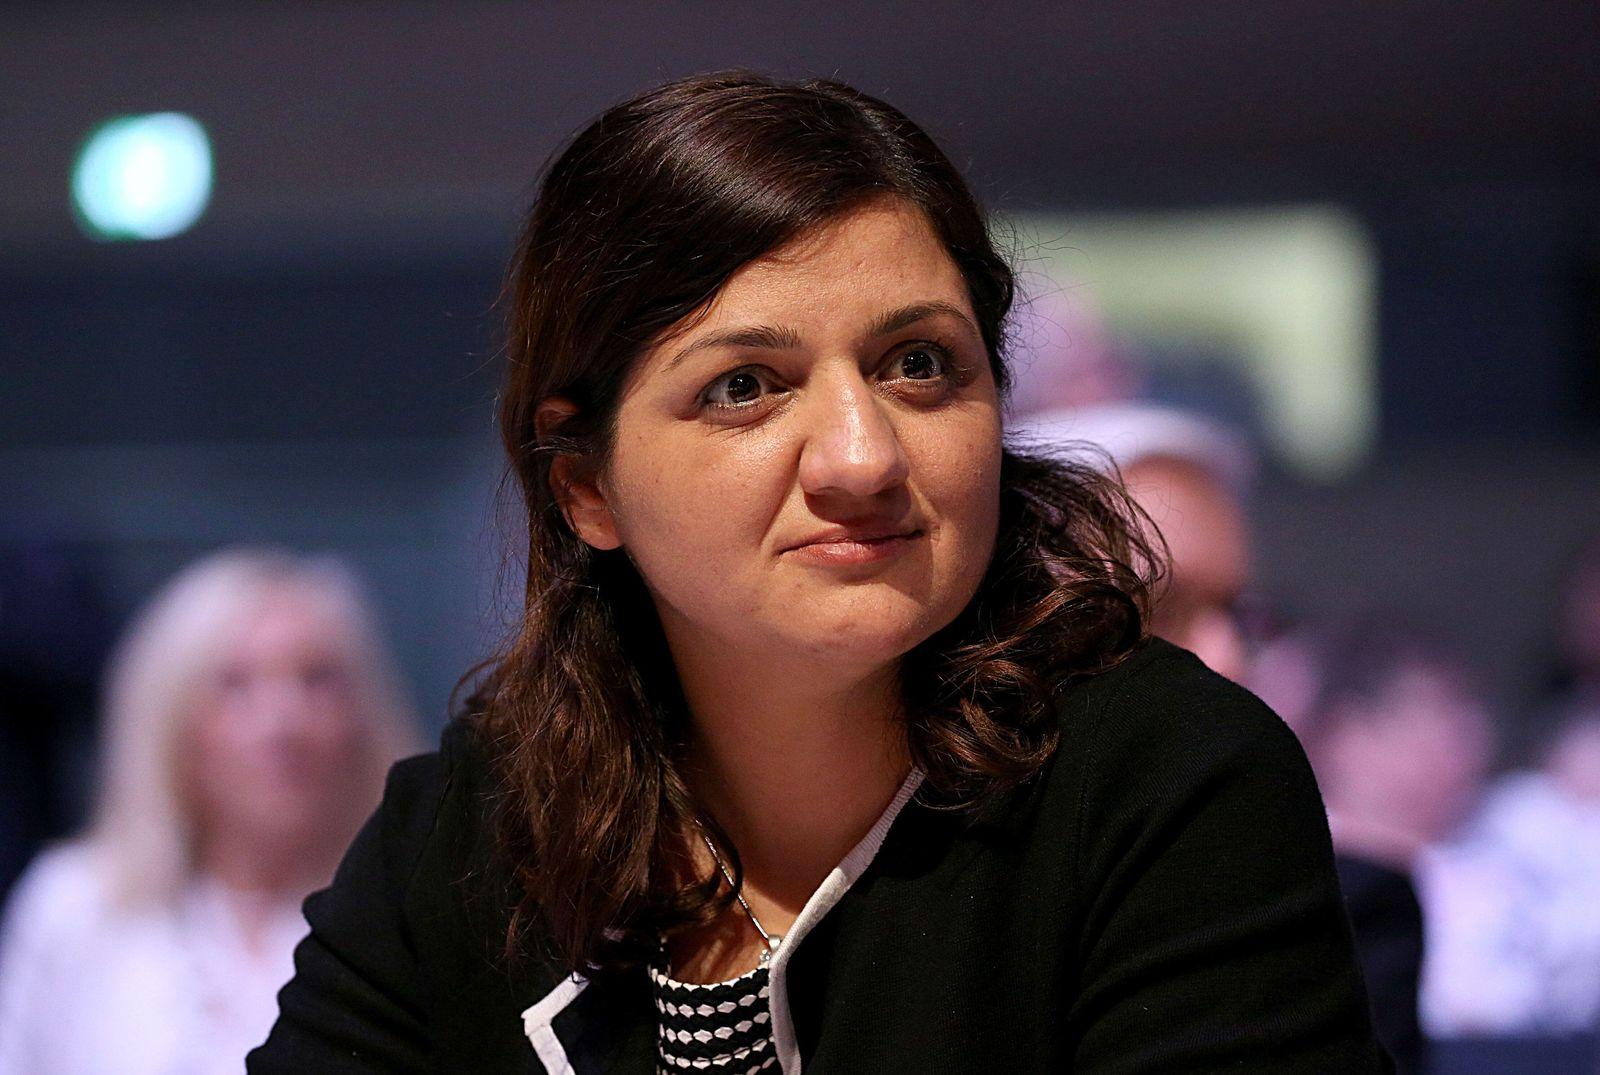 Parteitag Die Linke in Bonn / Özlem Demirel